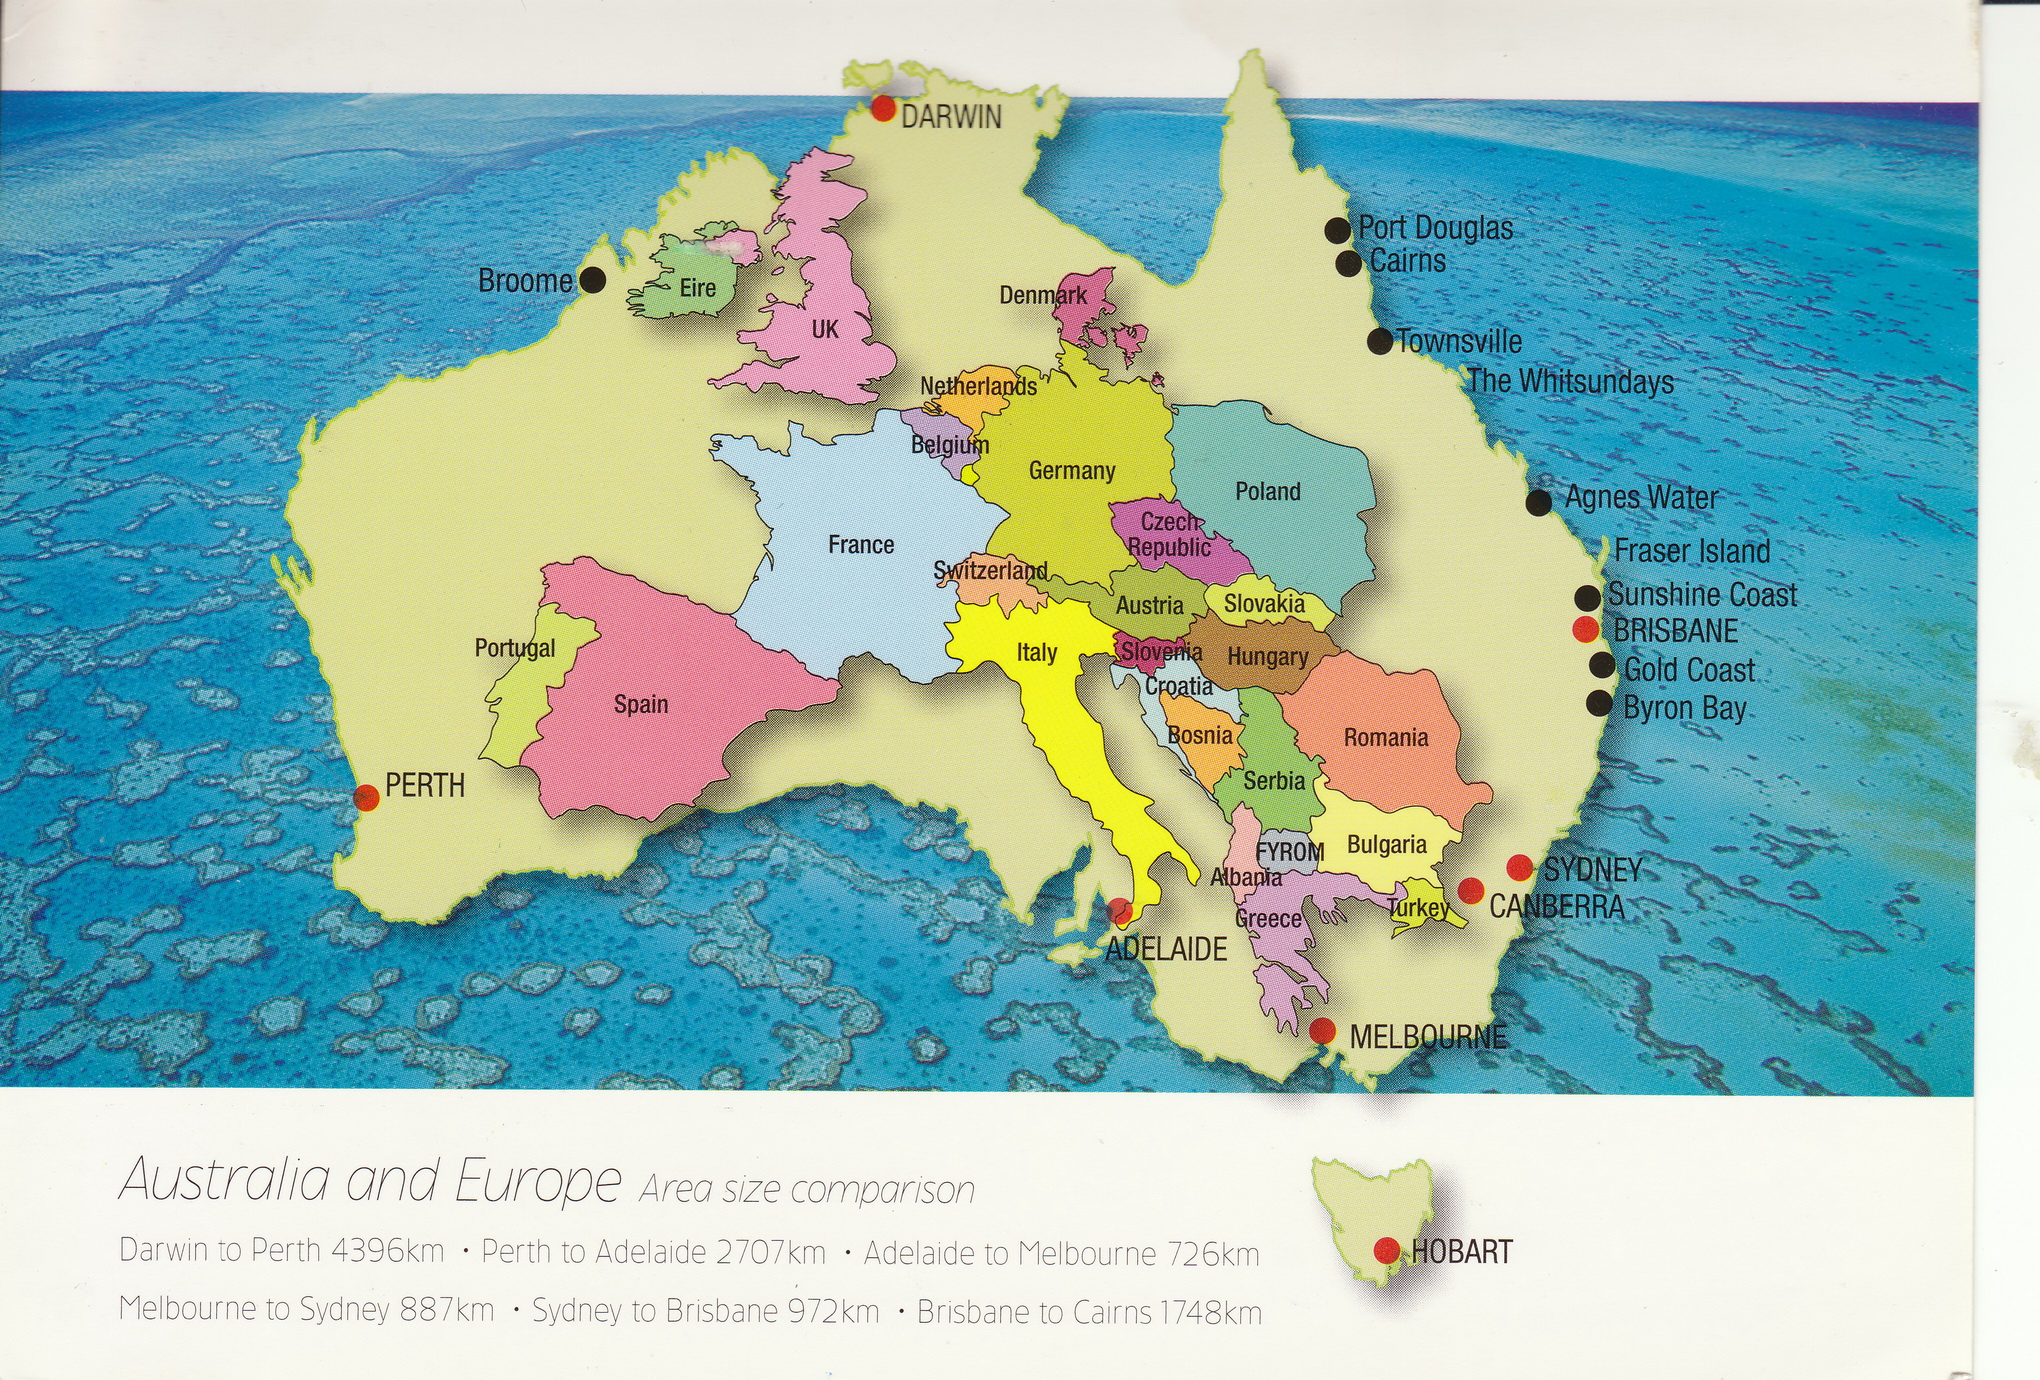 Imagen tomada de http://mypostalcards.files.wordpress.com/2012/09/australia-and-europe-size-comparison.jpg